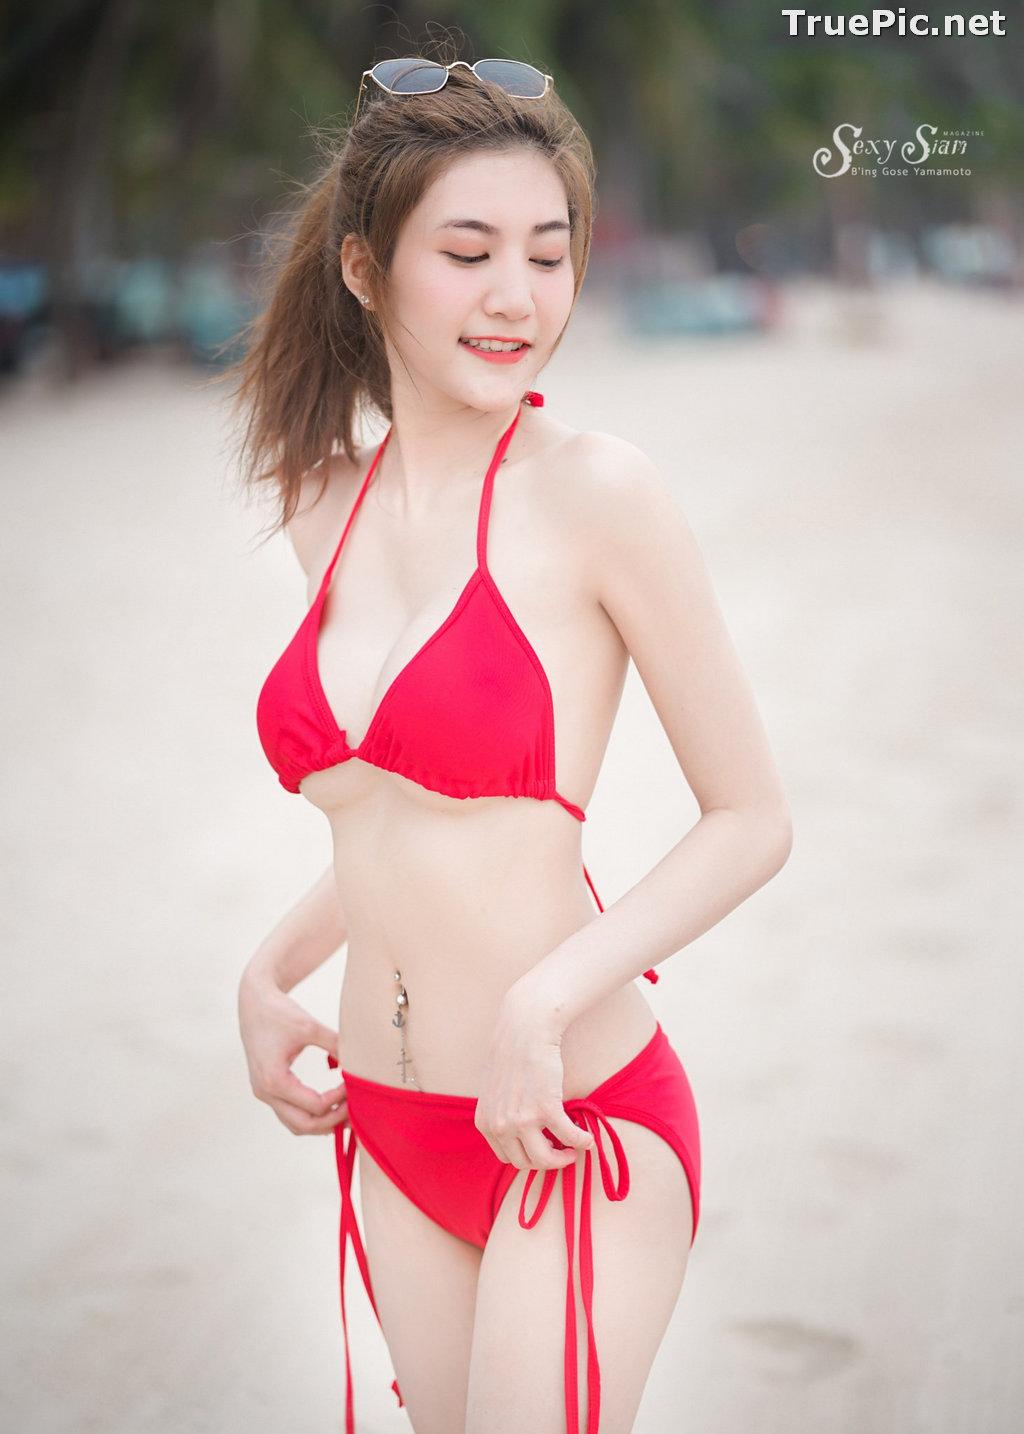 Image Thailand Model - Nitchakan Thongruangkitti - Red Fern Bikini - TruePic.net - Picture-6